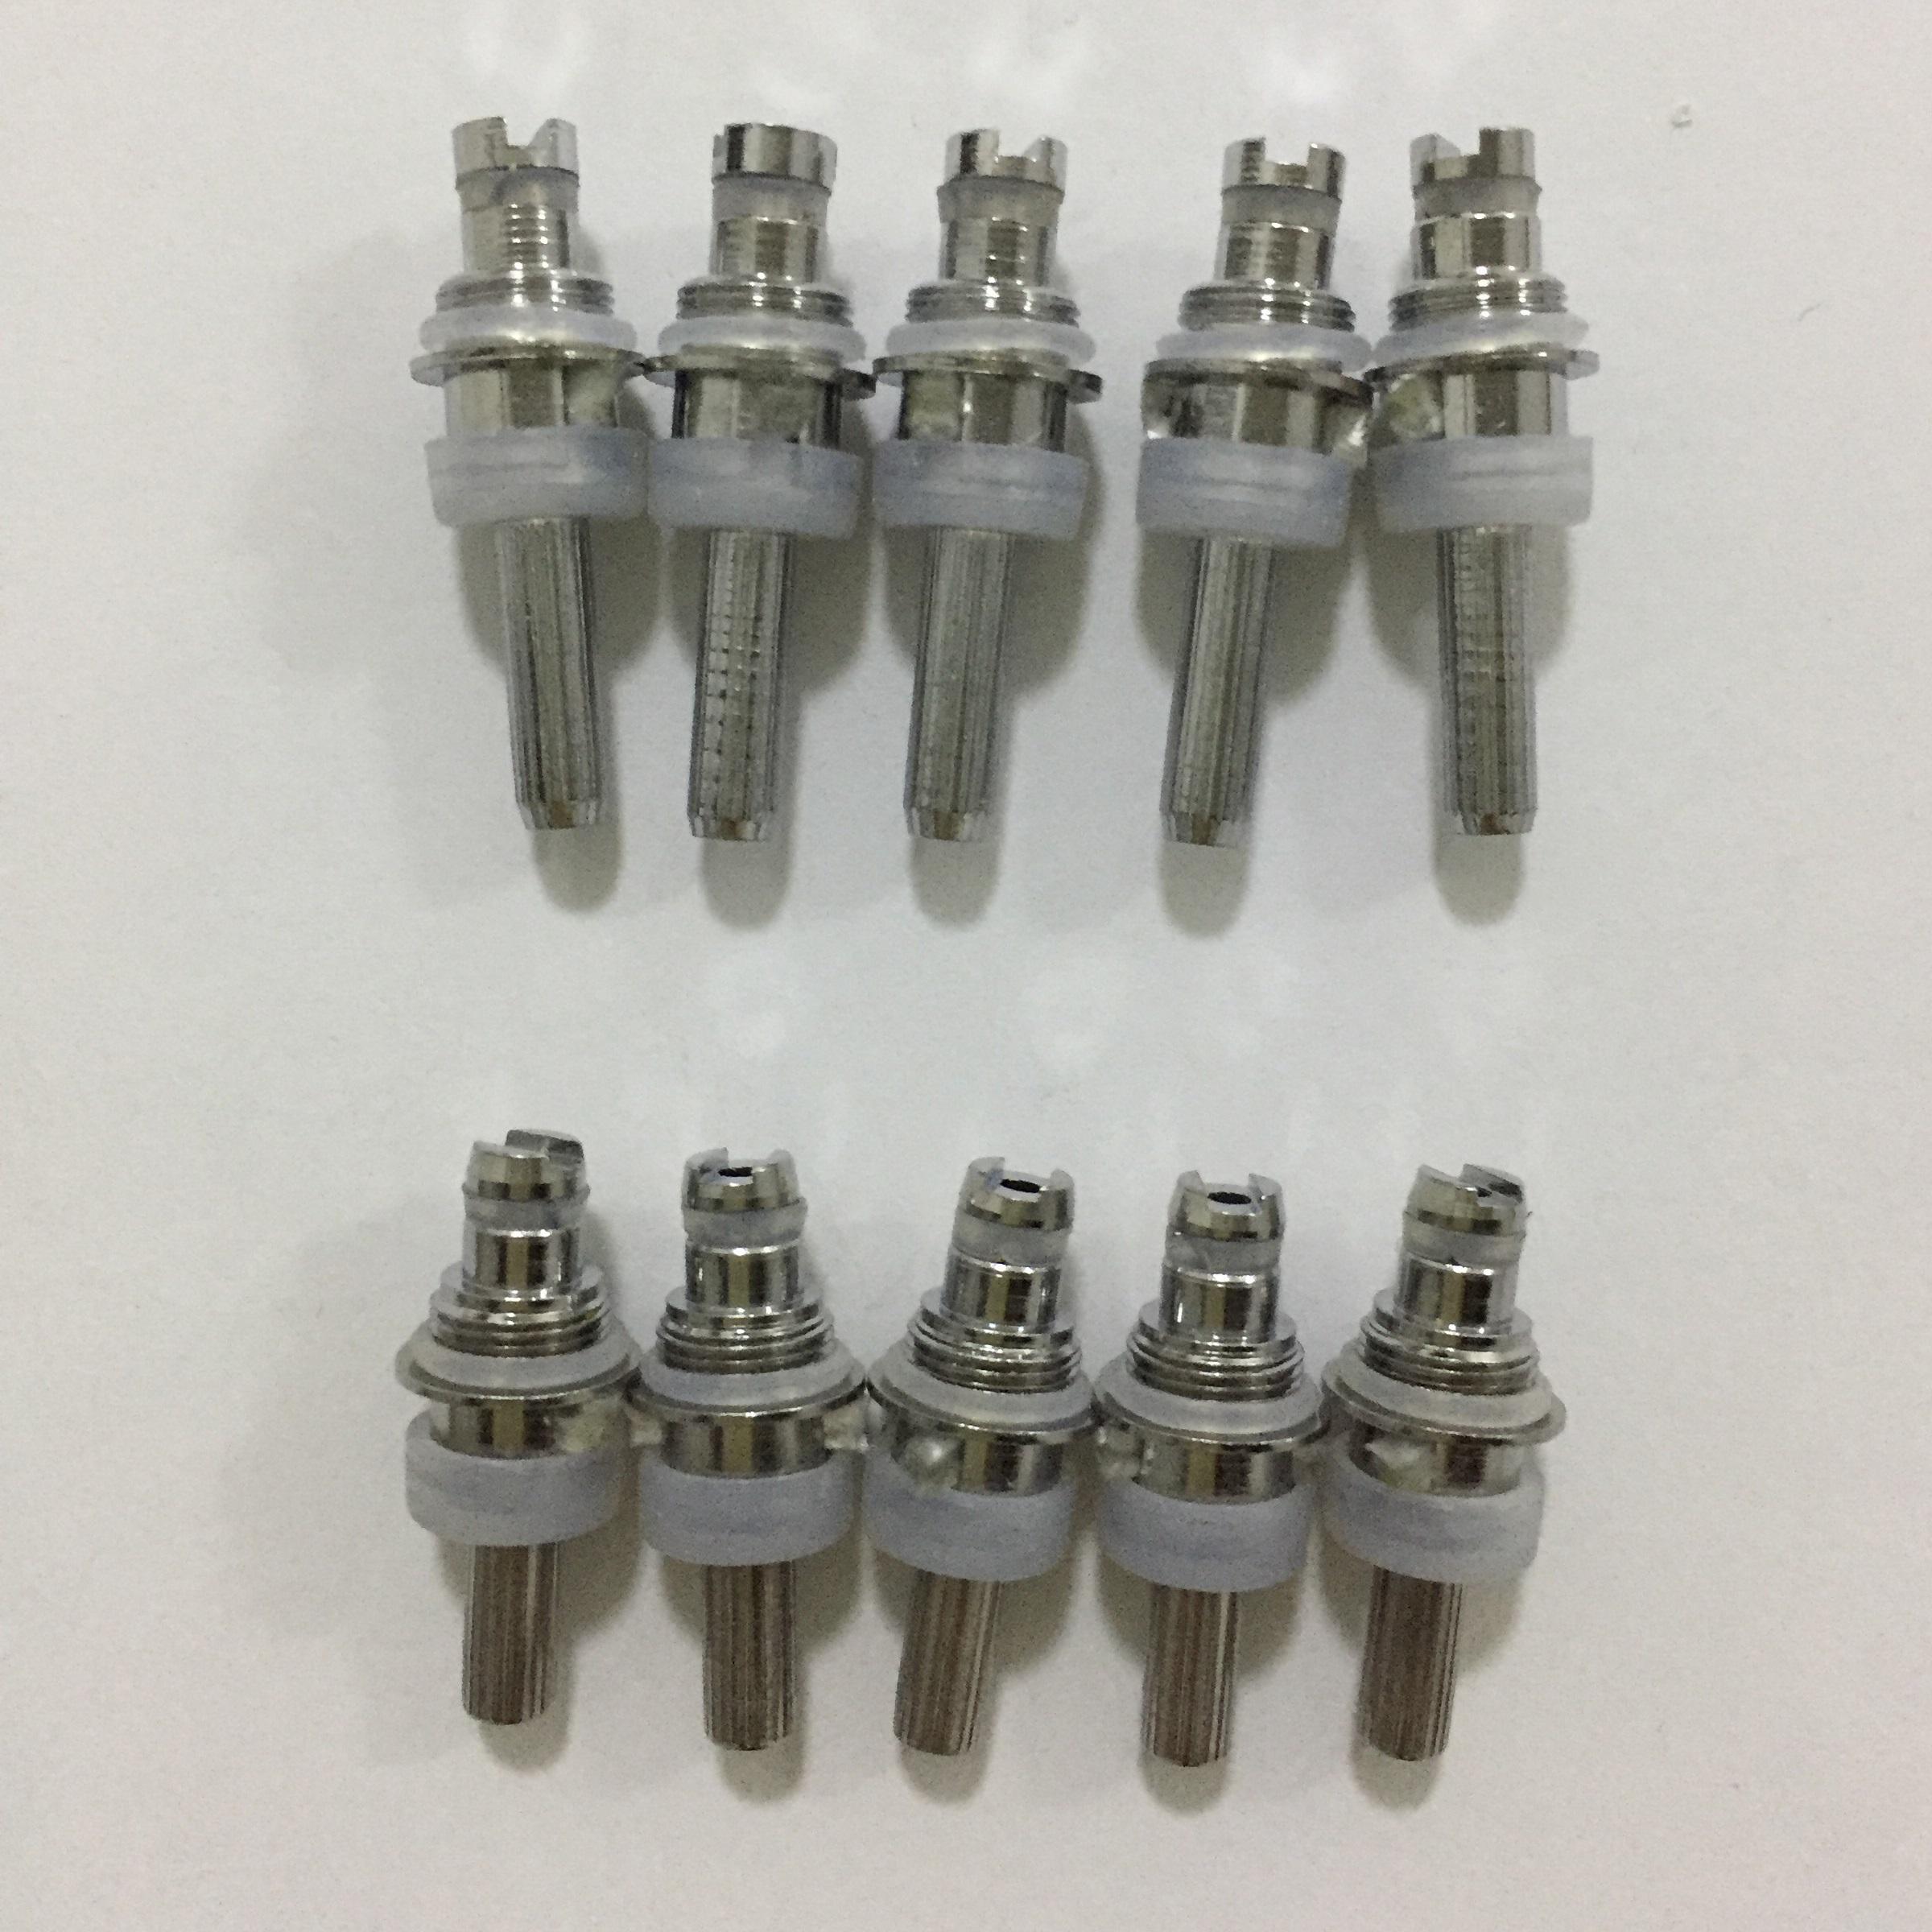 البخاخة الساخنة استبدال لفائف ل MT3 H2 T3S T4 بروتان 1 2 مصغرة Protank Cartomizer Clearomizer استبدال كور رئيس bestvaporseller epacket